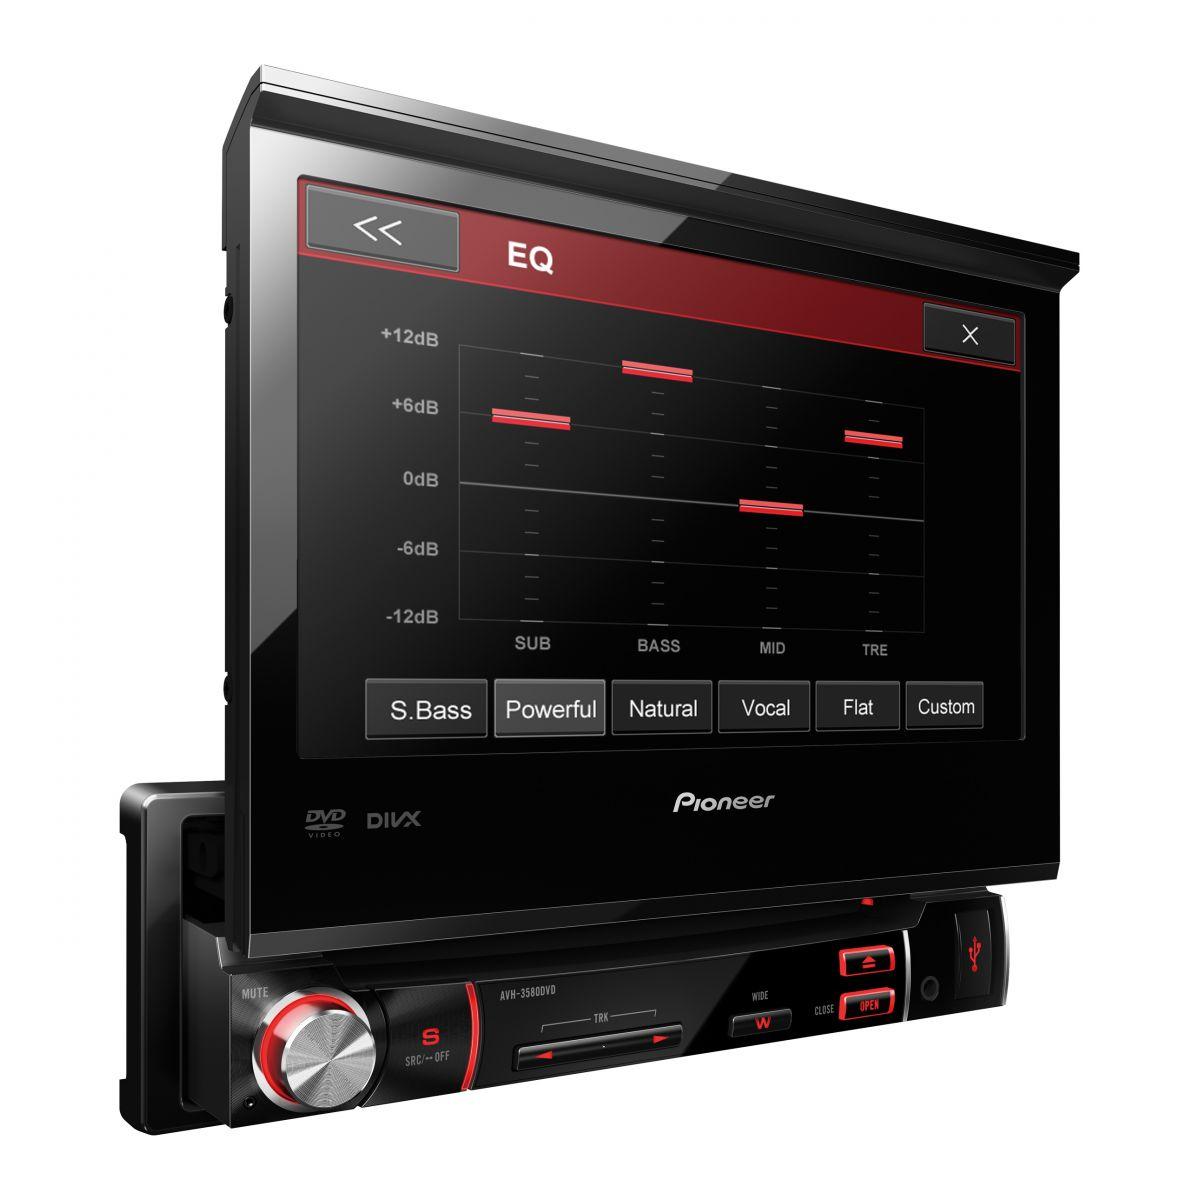 Dvd Player Autmotivo Pioneer AVH-3580DVD Retrátil 7 Polegadas Usb Touch Screen